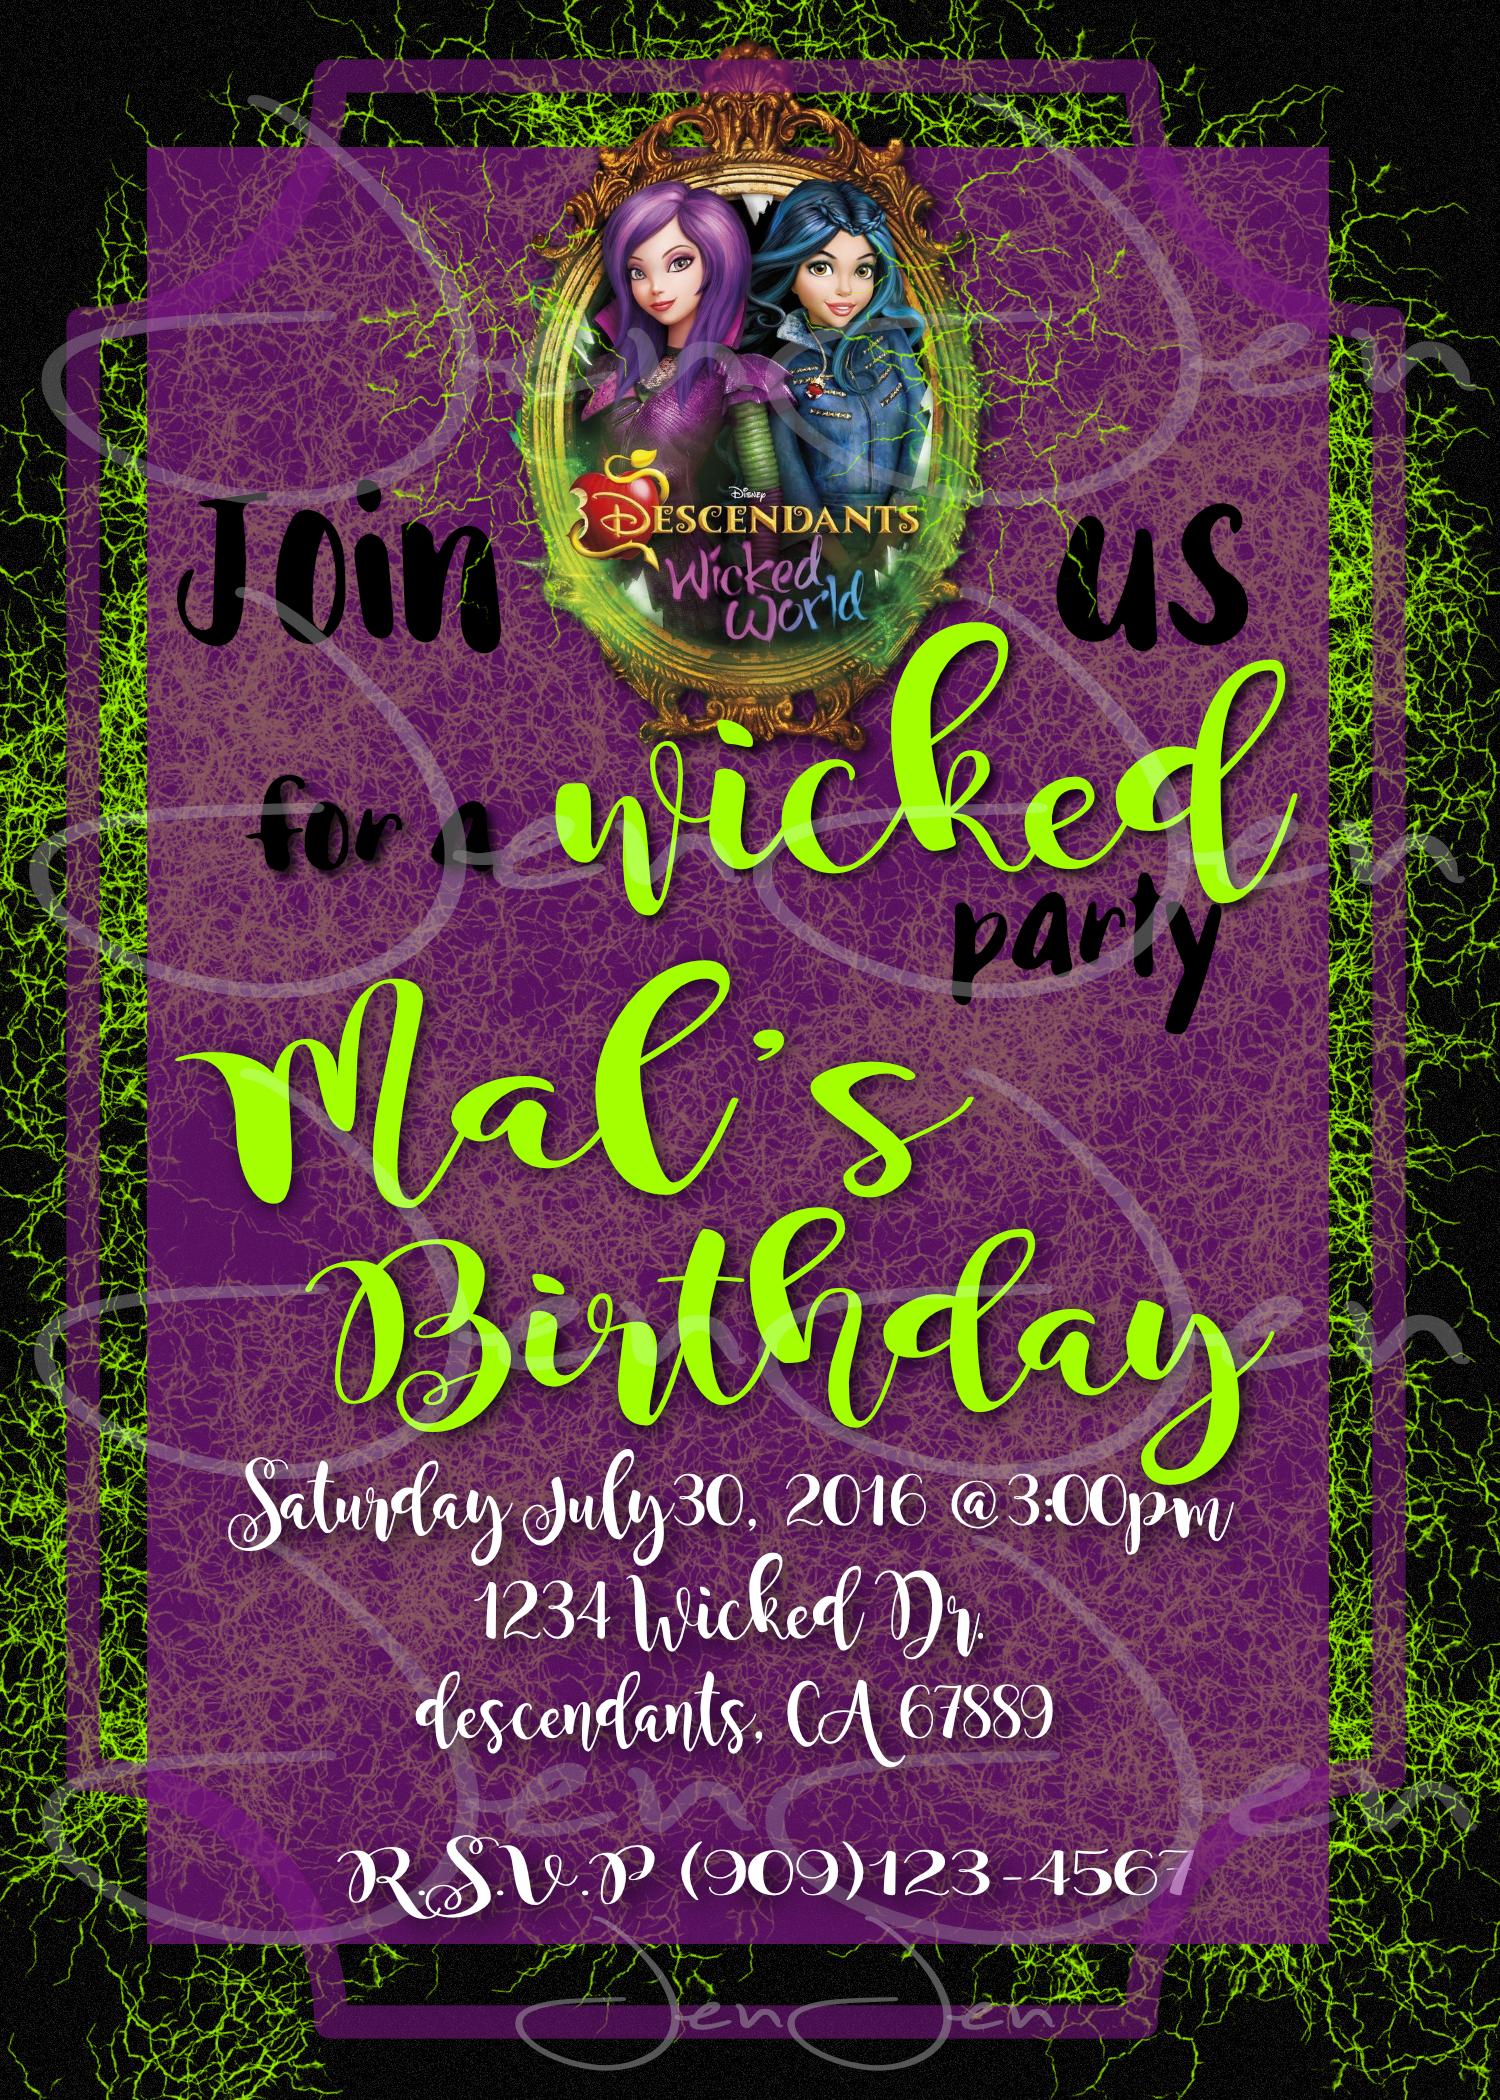 disney descendants party invitation